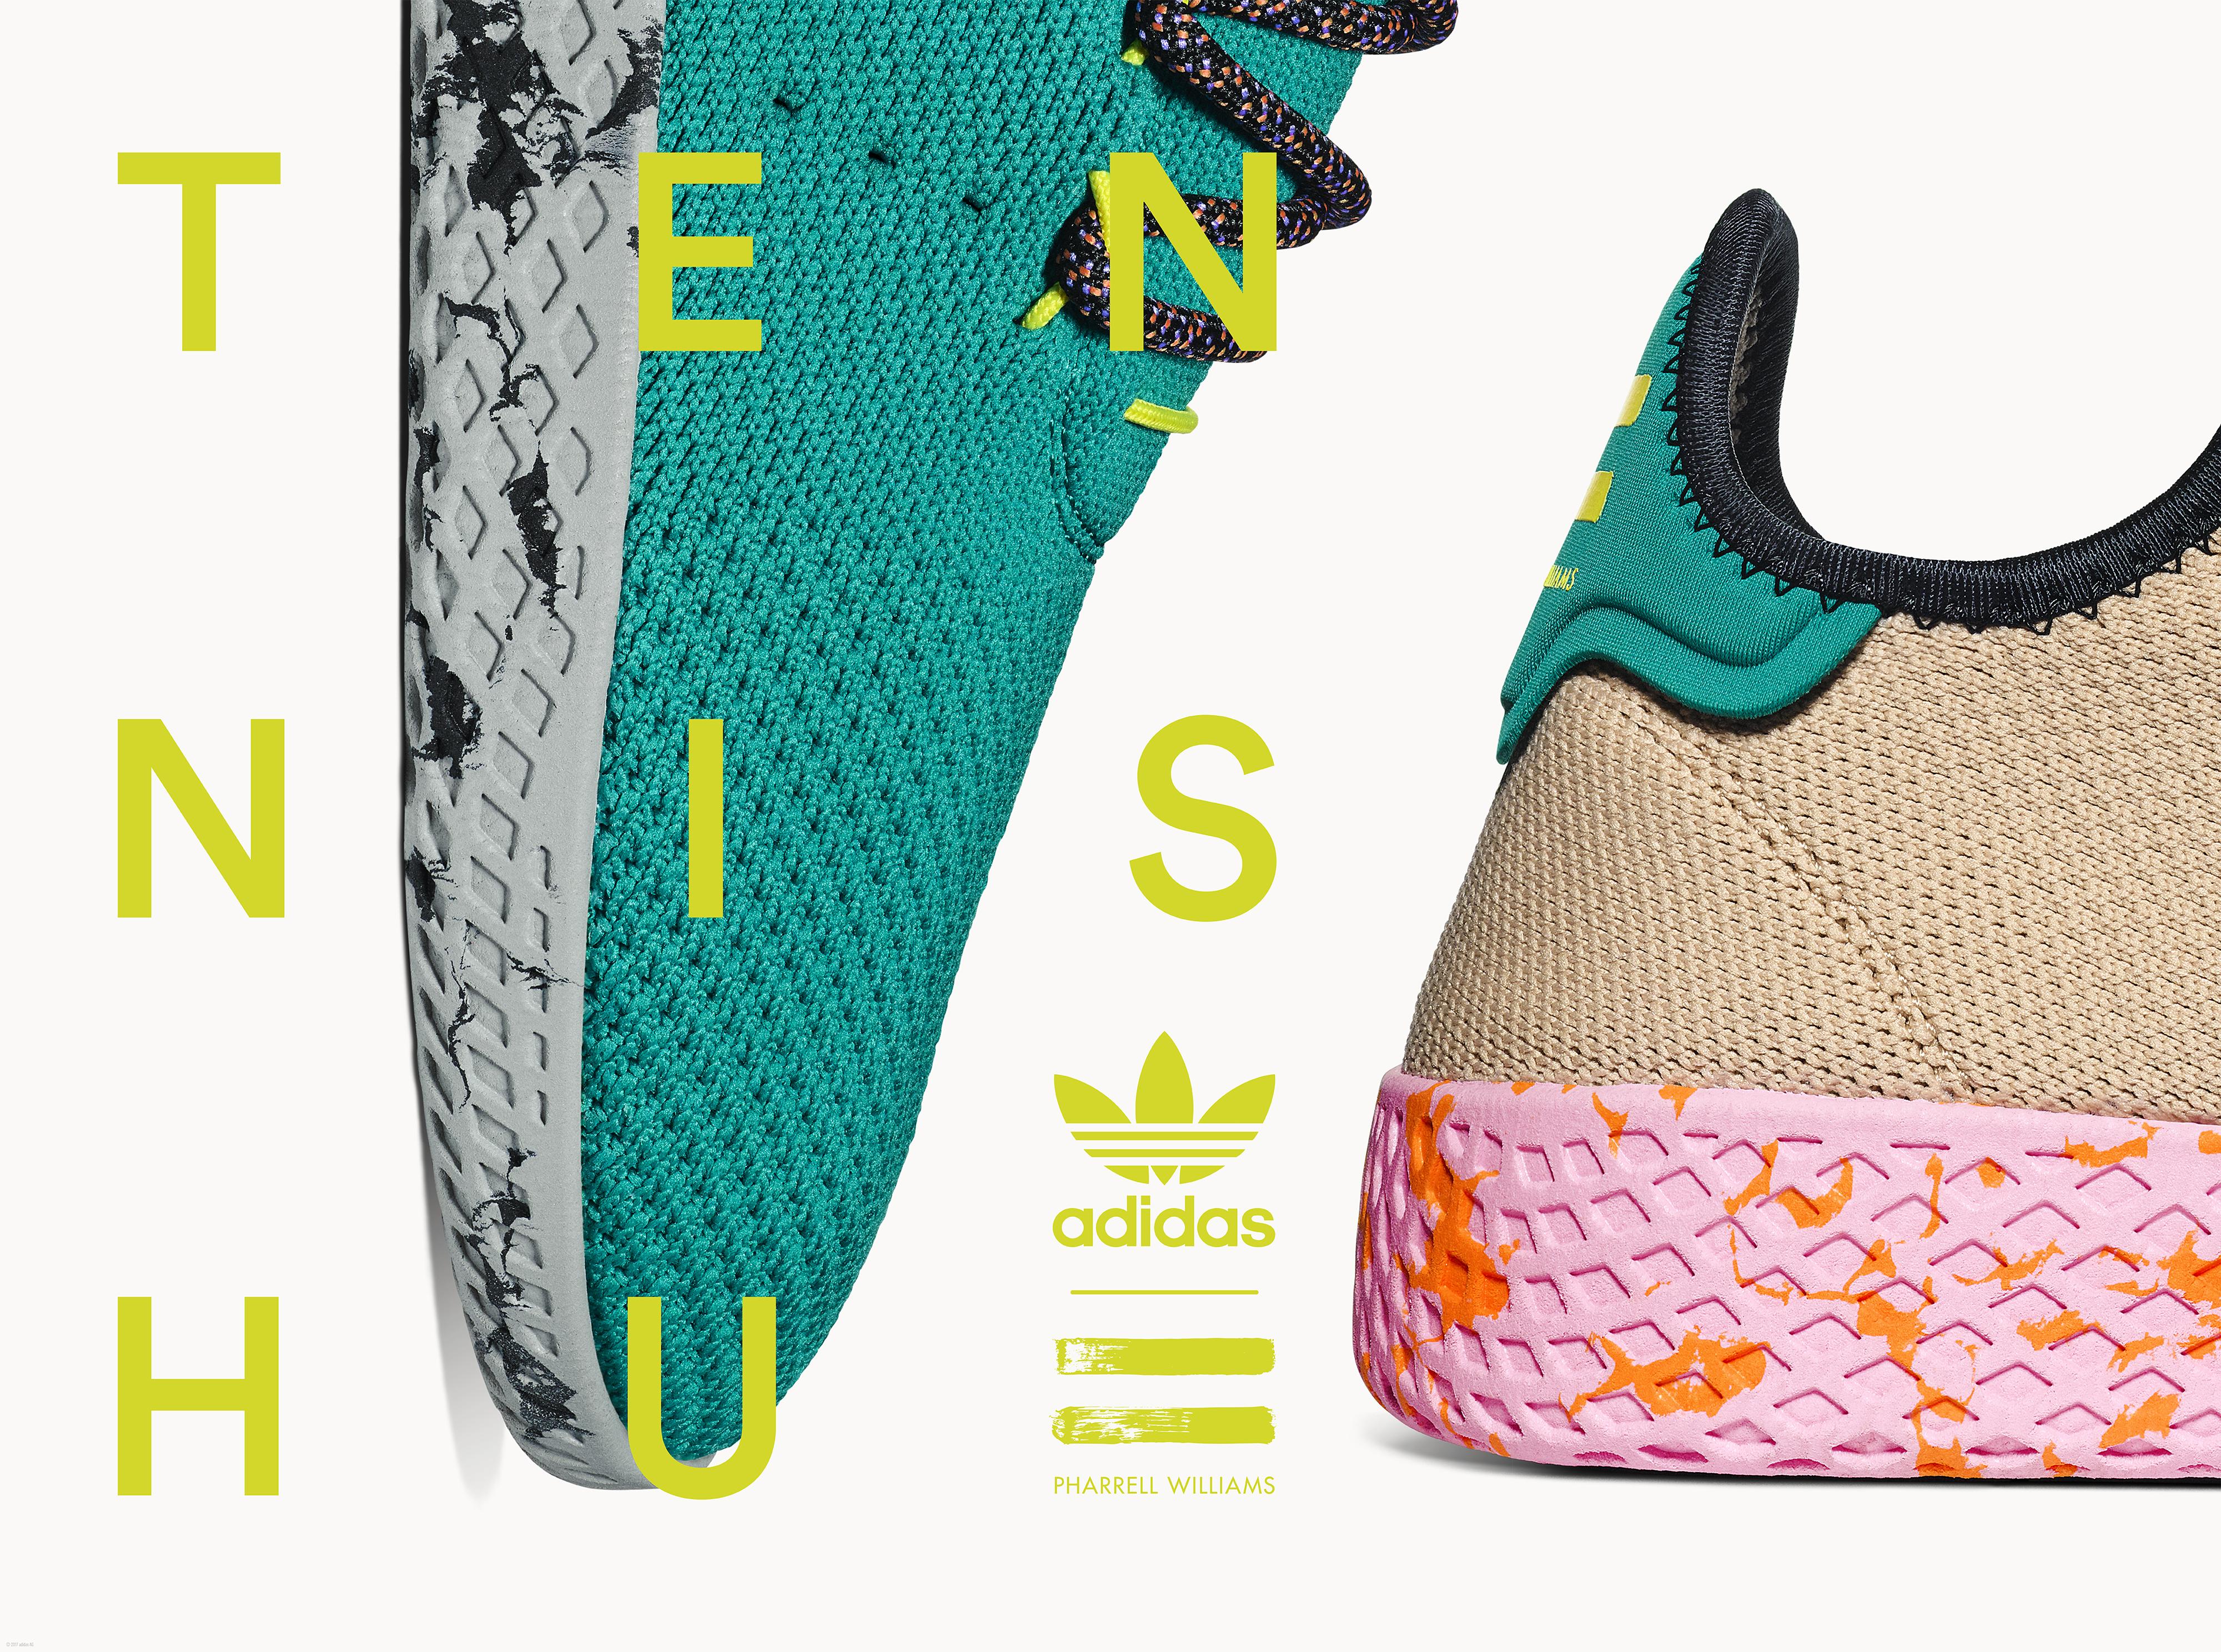 d43b7e8dd3ec2 Pharrell and Adidas Team Up for Summer Release of Tennis Hu Part 2